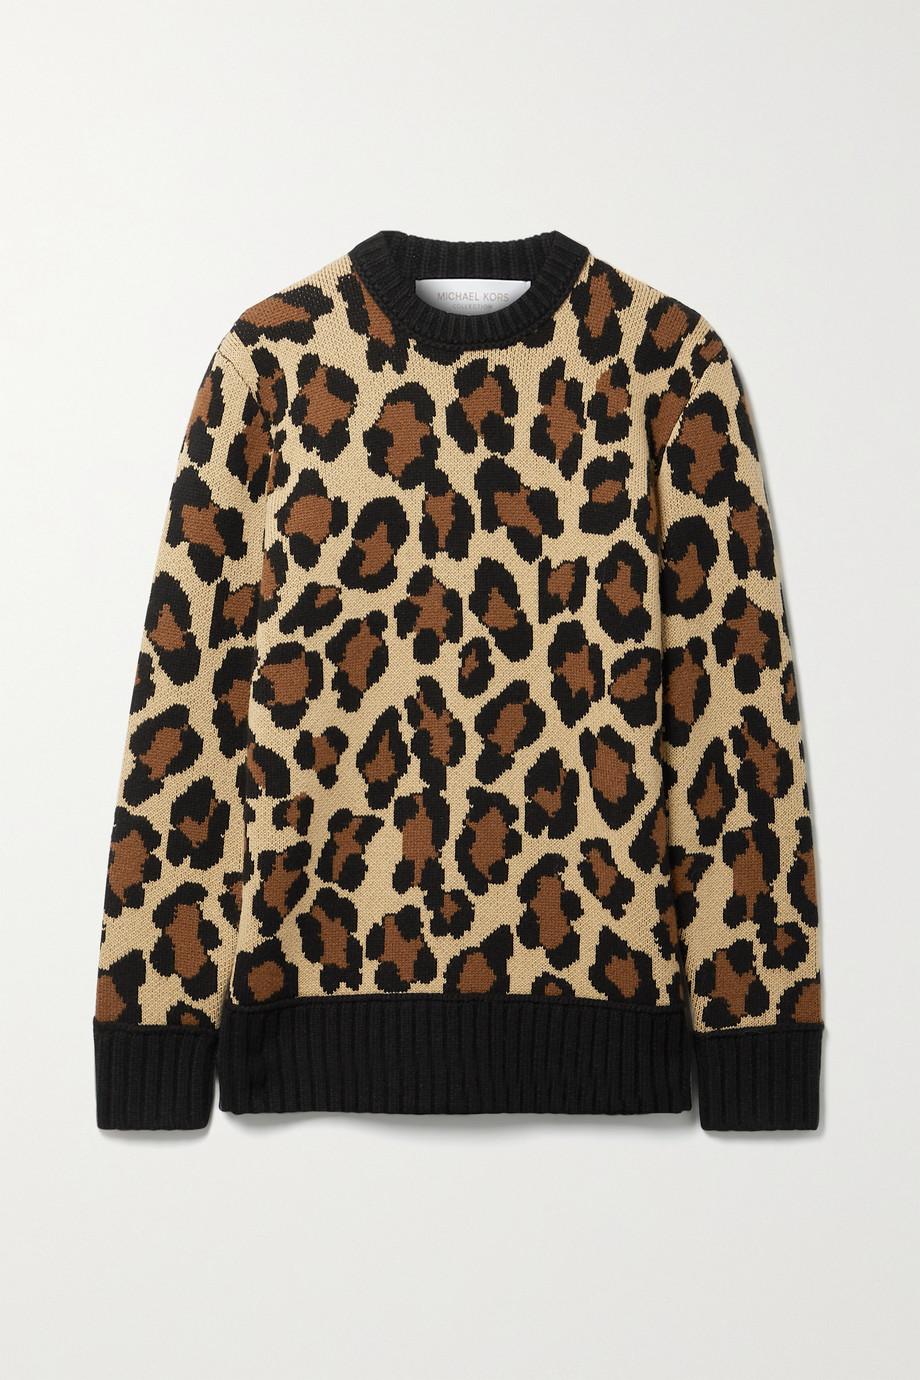 Michael Kors Collection Leopard-jacquard cashmere sweater